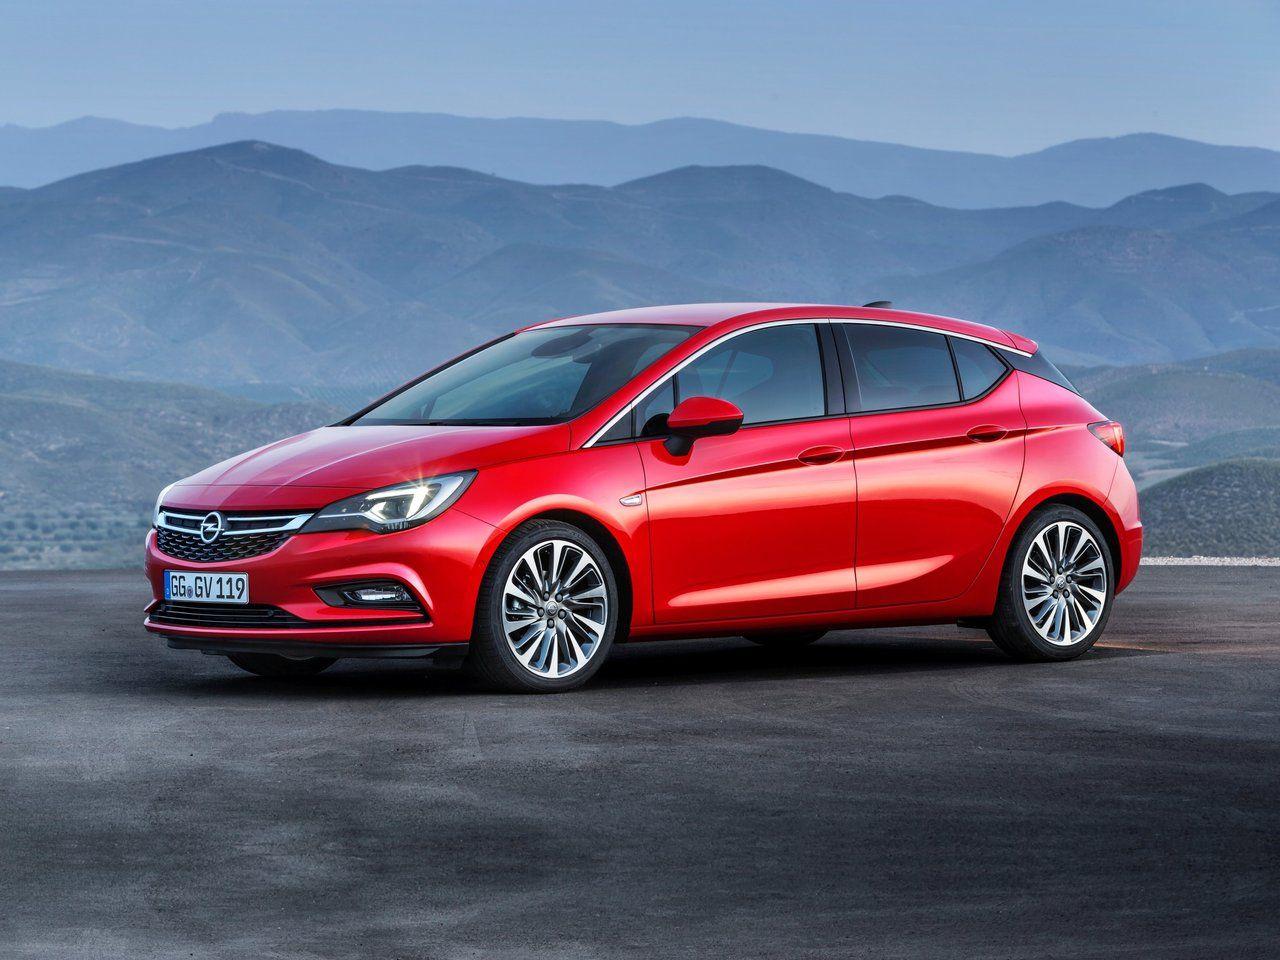 Opel Astra Technical Specifications >> Opel Astra K 1 6 Cdti 160 Hp Ecoflex Start Stop Technical